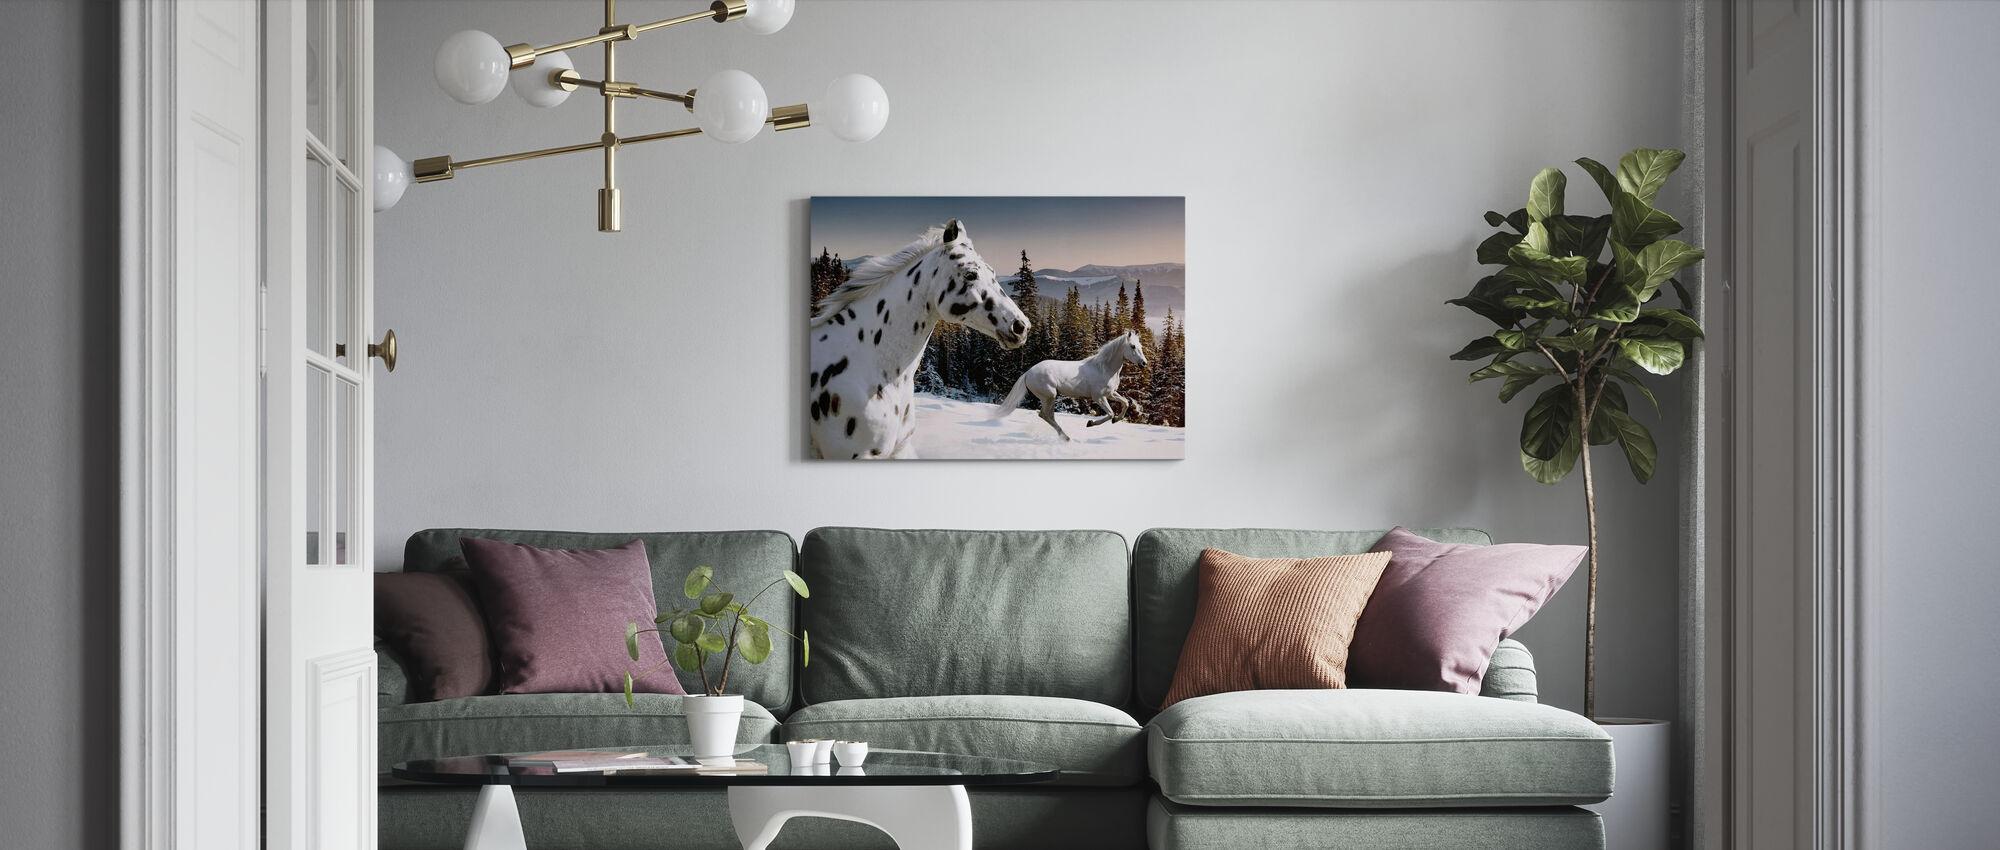 Galopping vinter Eventyrland - Lerretsbilde - Stue